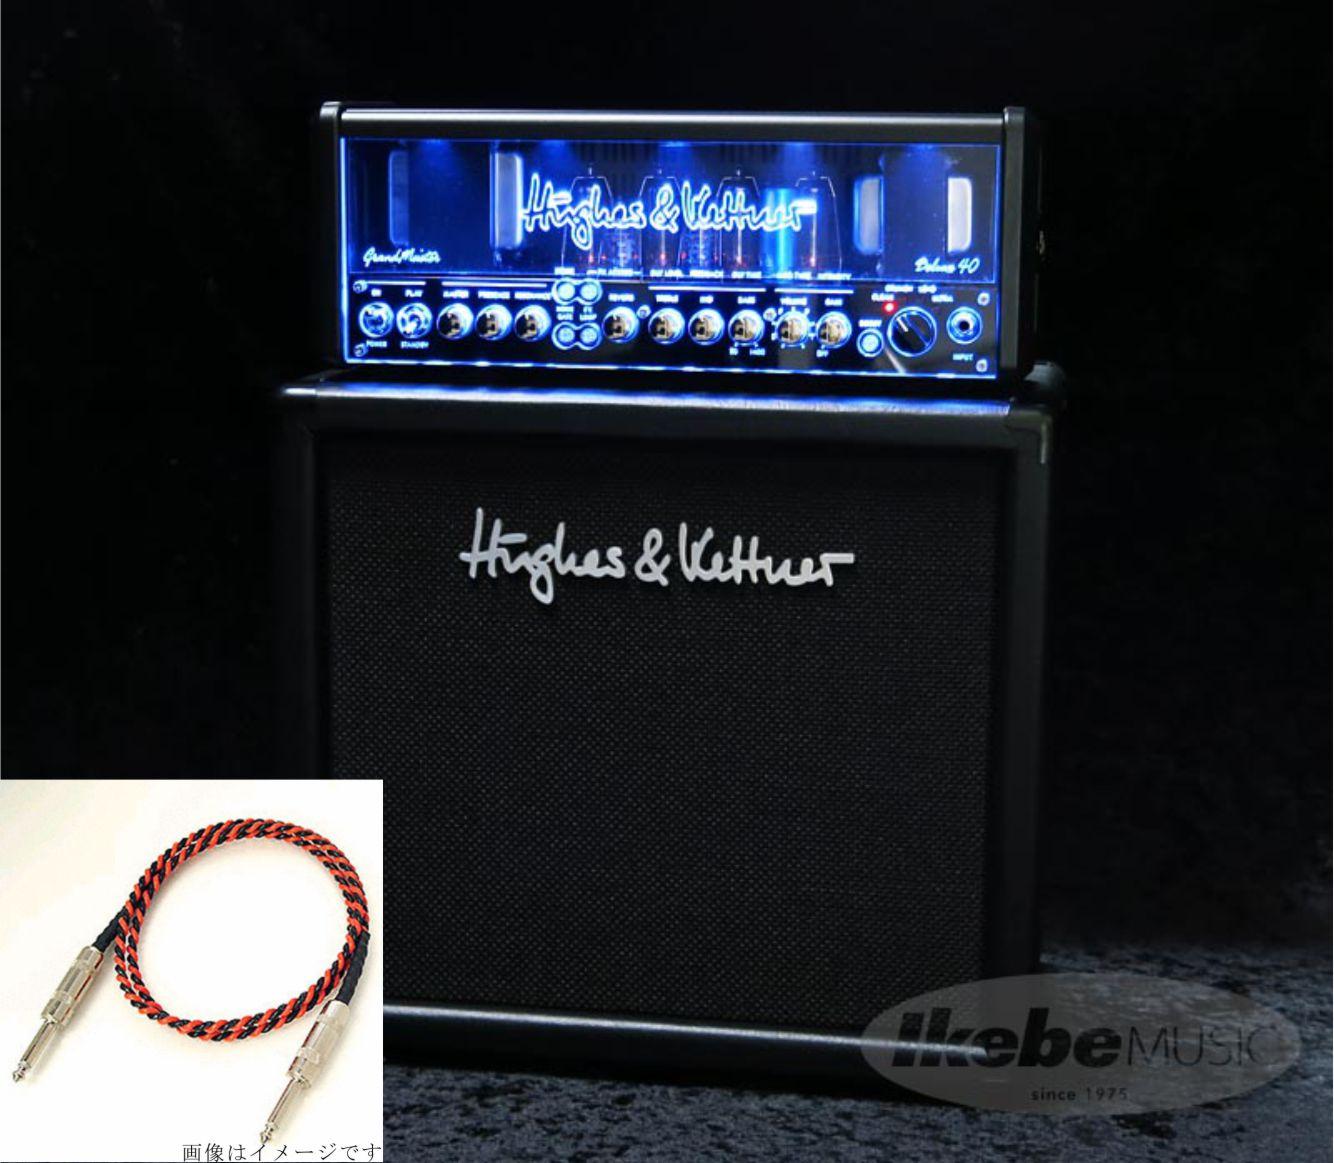 Hughes&Kettner 《ヒュース&ケトナー》GrandMeister Deluxe 40 & TubeMeister 112 Cabinet【数量限定ロゴ入り特製ハードケース&Tシャツプレゼント!】Belden 9497ケーブル・プレゼント【送料無料!】